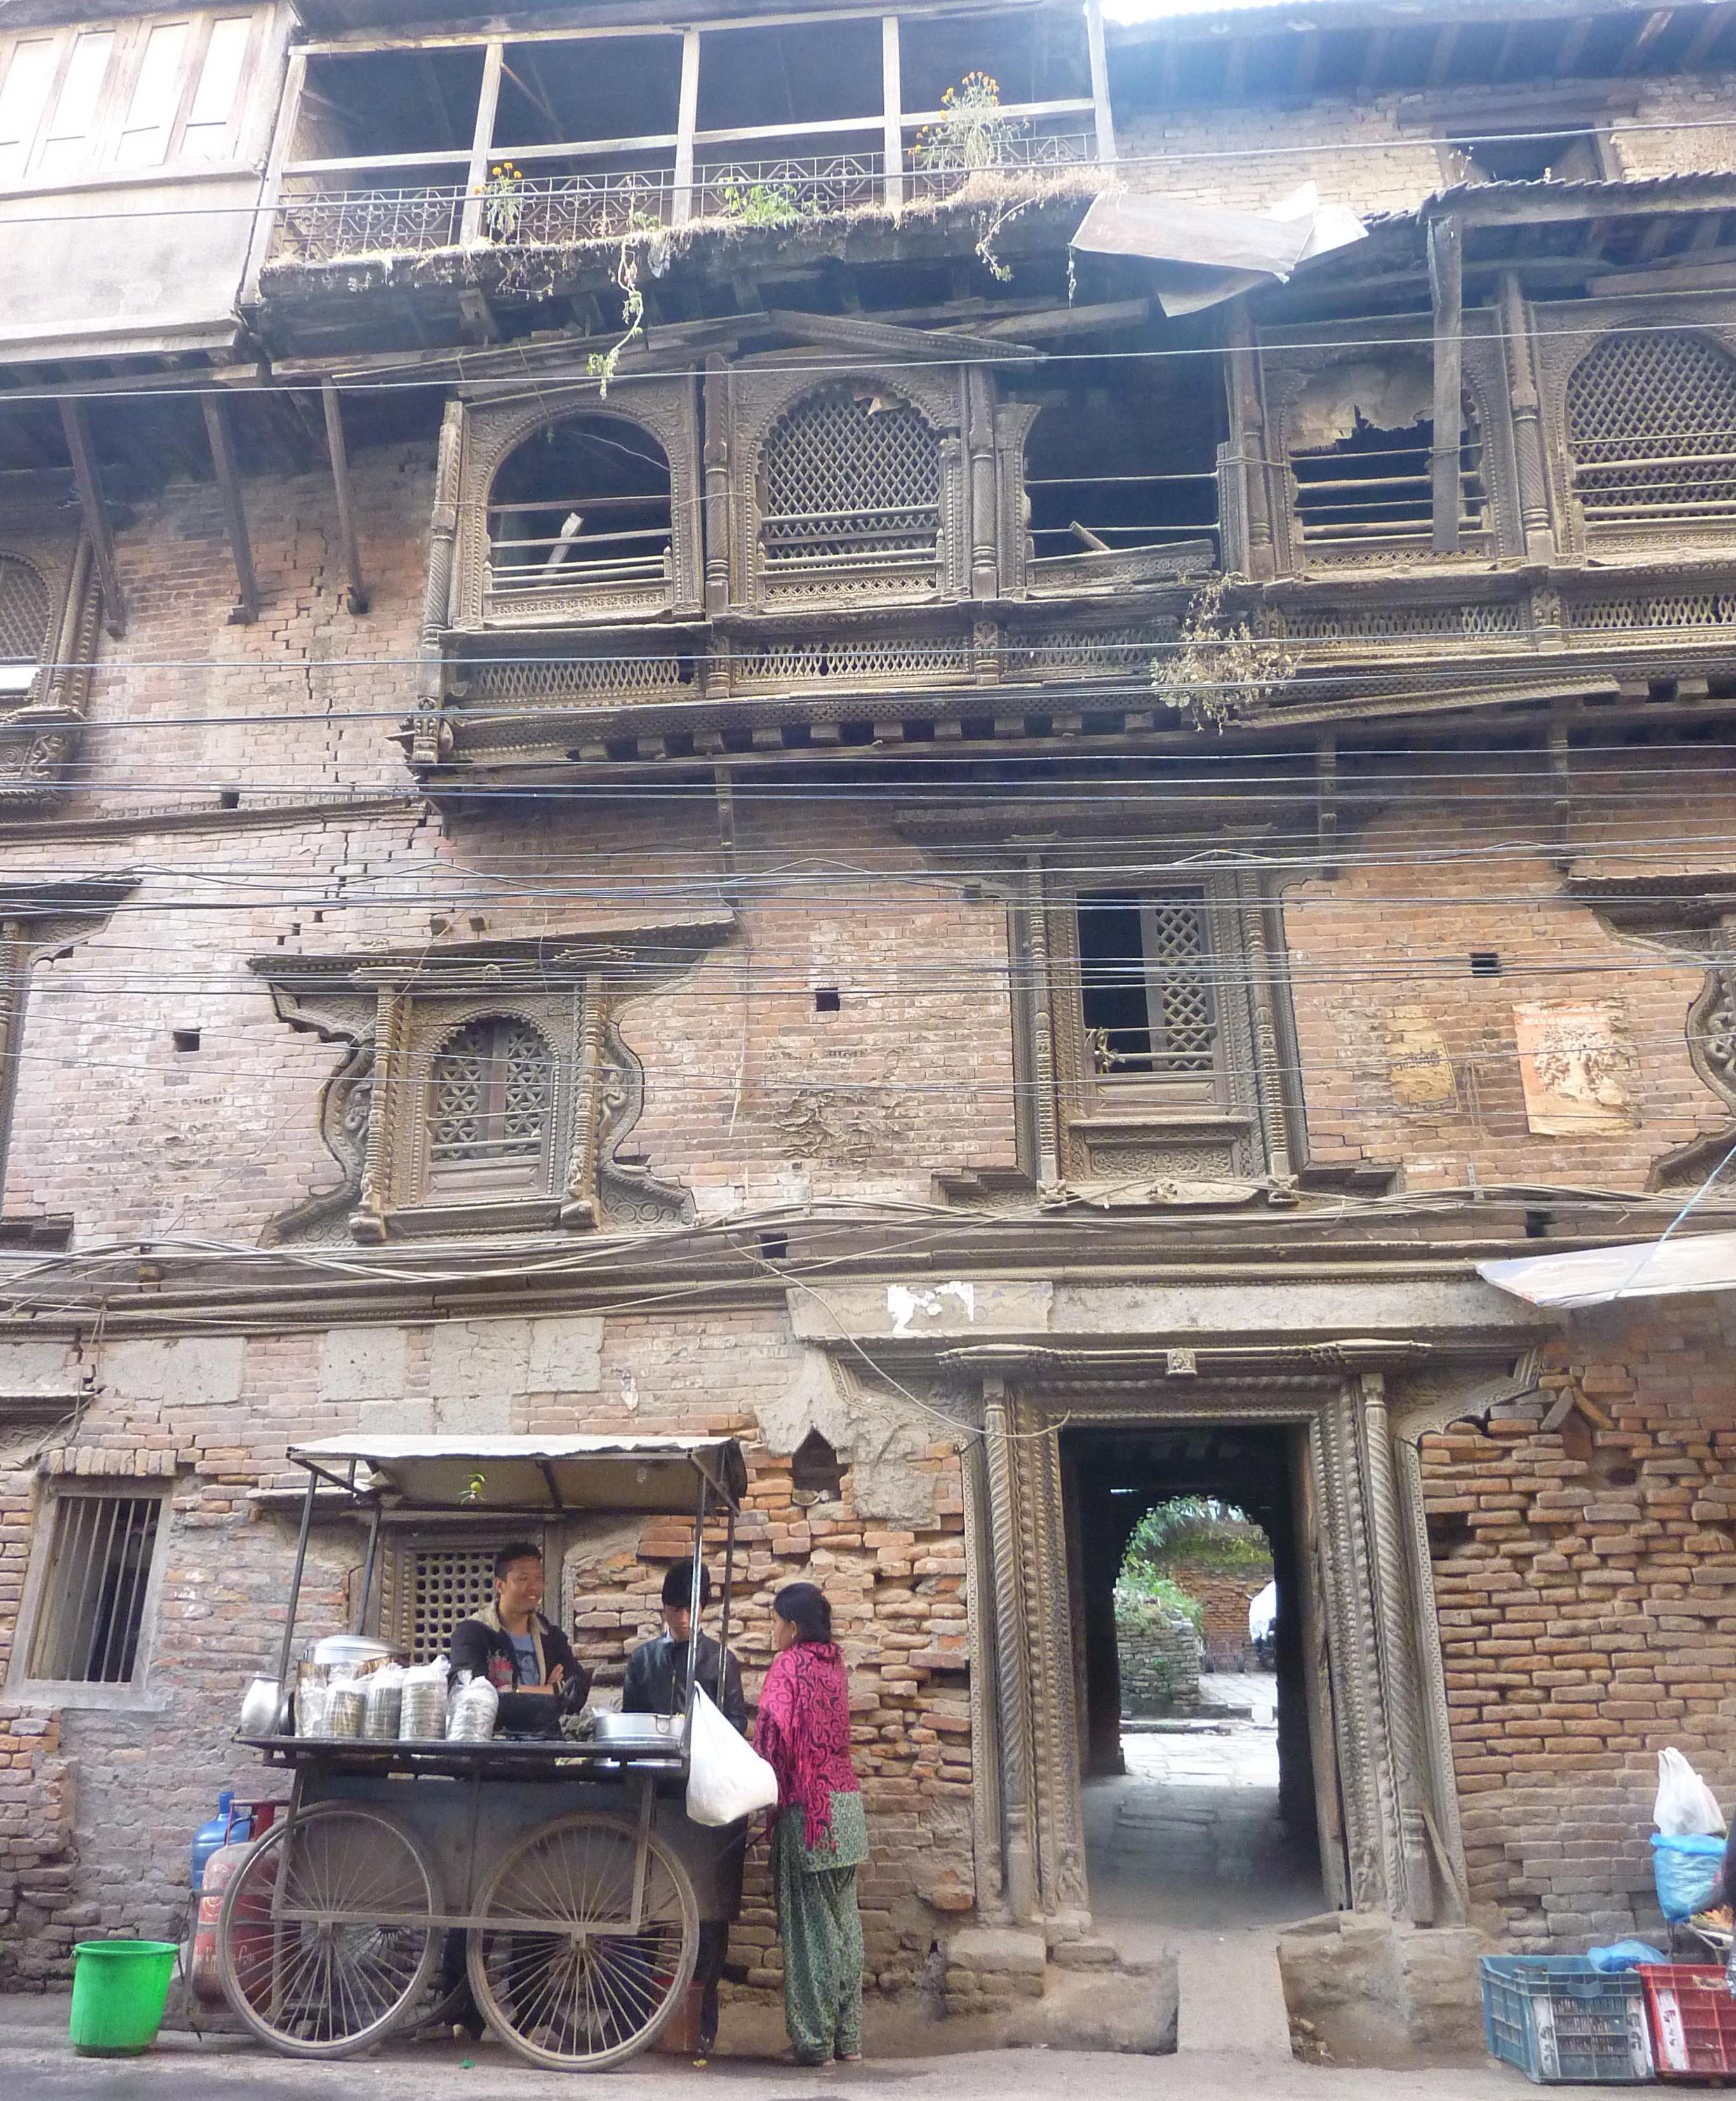 A Very Old Old Building in Kathmandu